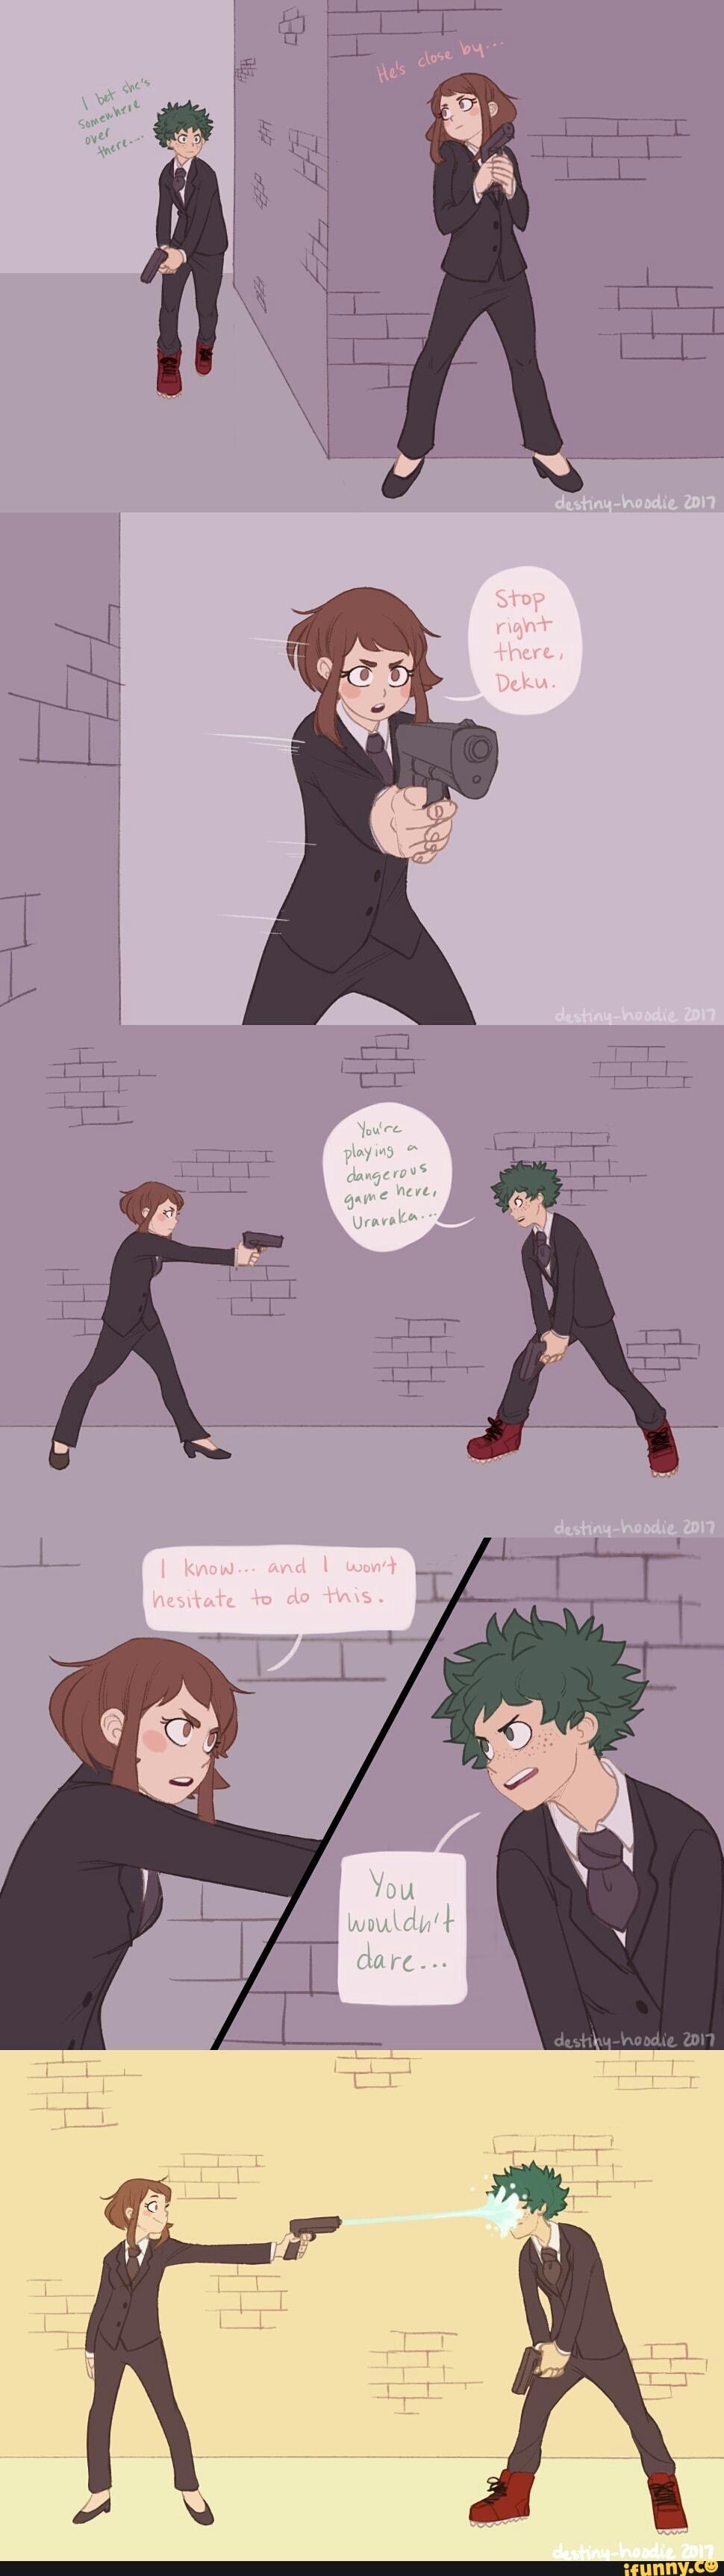 Picture Memes Zjkphx6v4 By Katsukibakuhoe 2014 2 Comments Ifunny My Hero My Hero Academia Episodes Hero